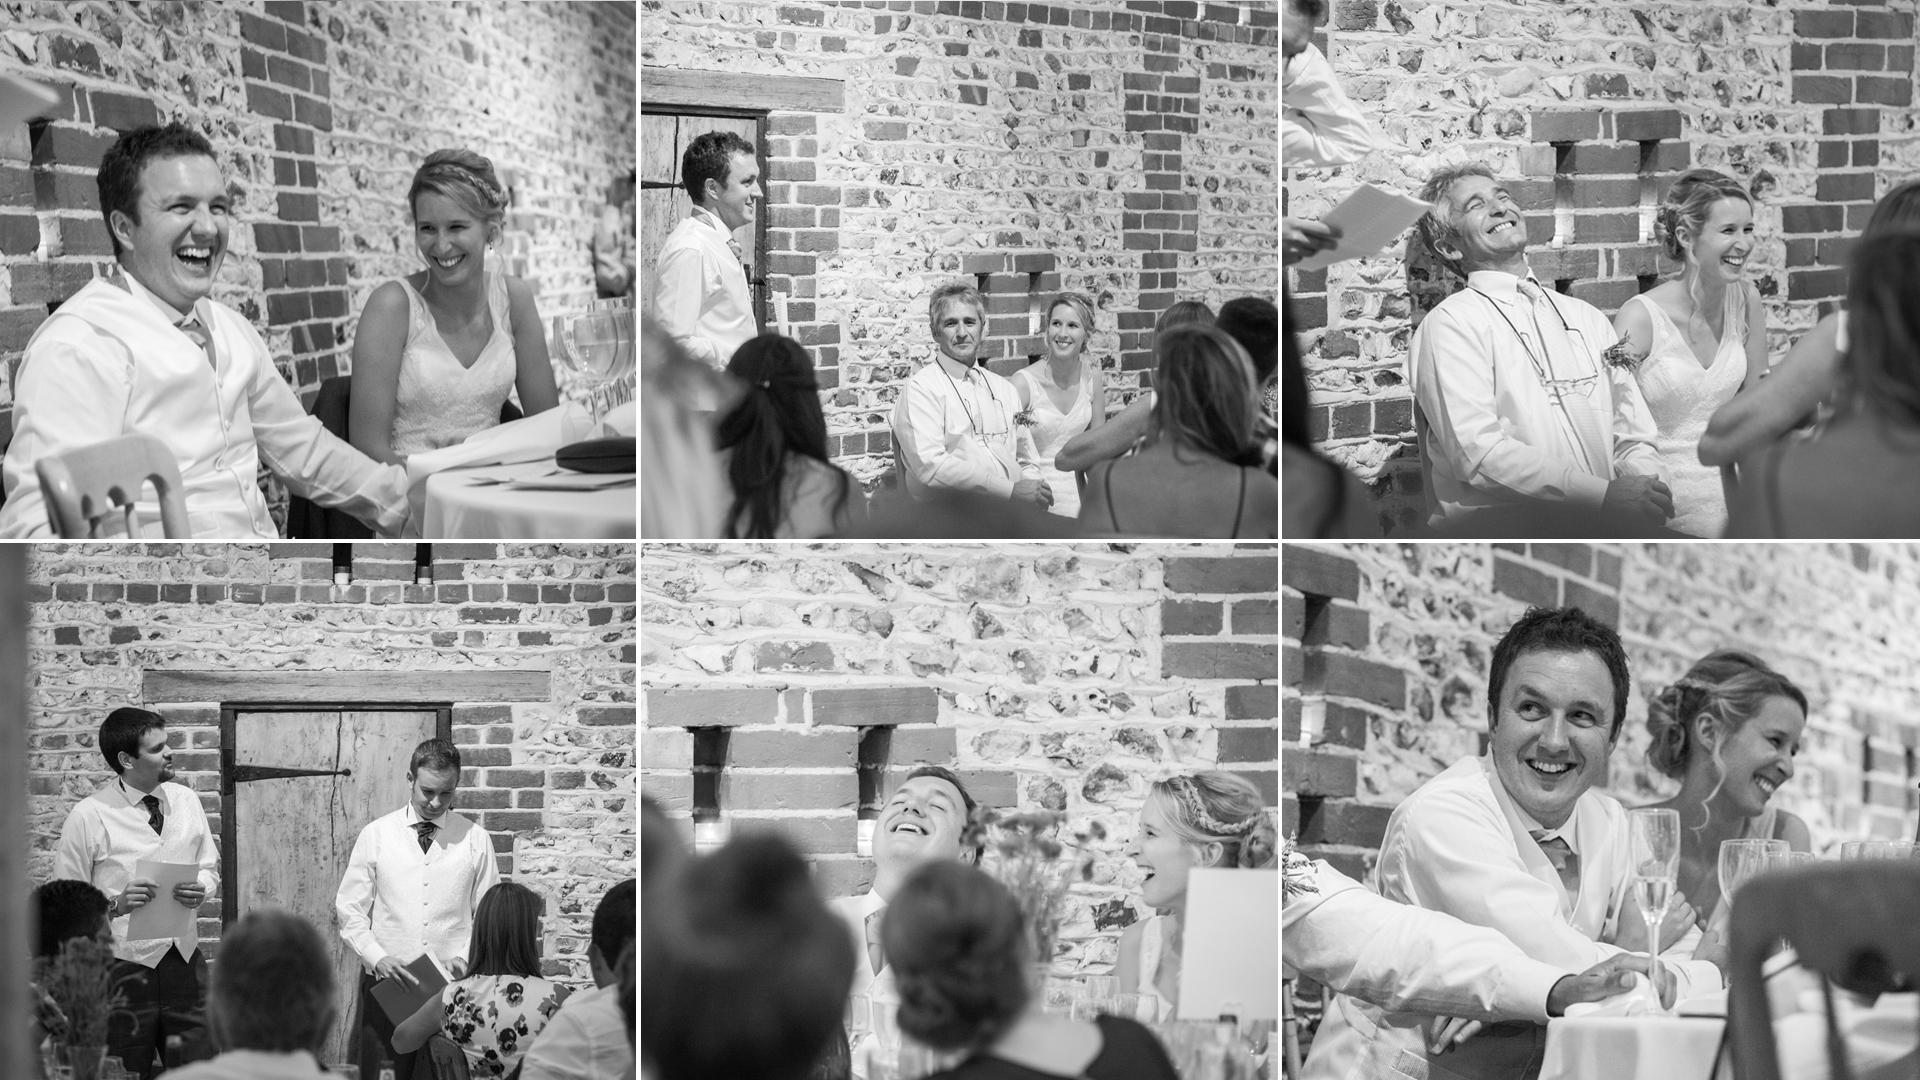 Upwaltham barns wedding photography, sussex wedding photographer, hayley rose